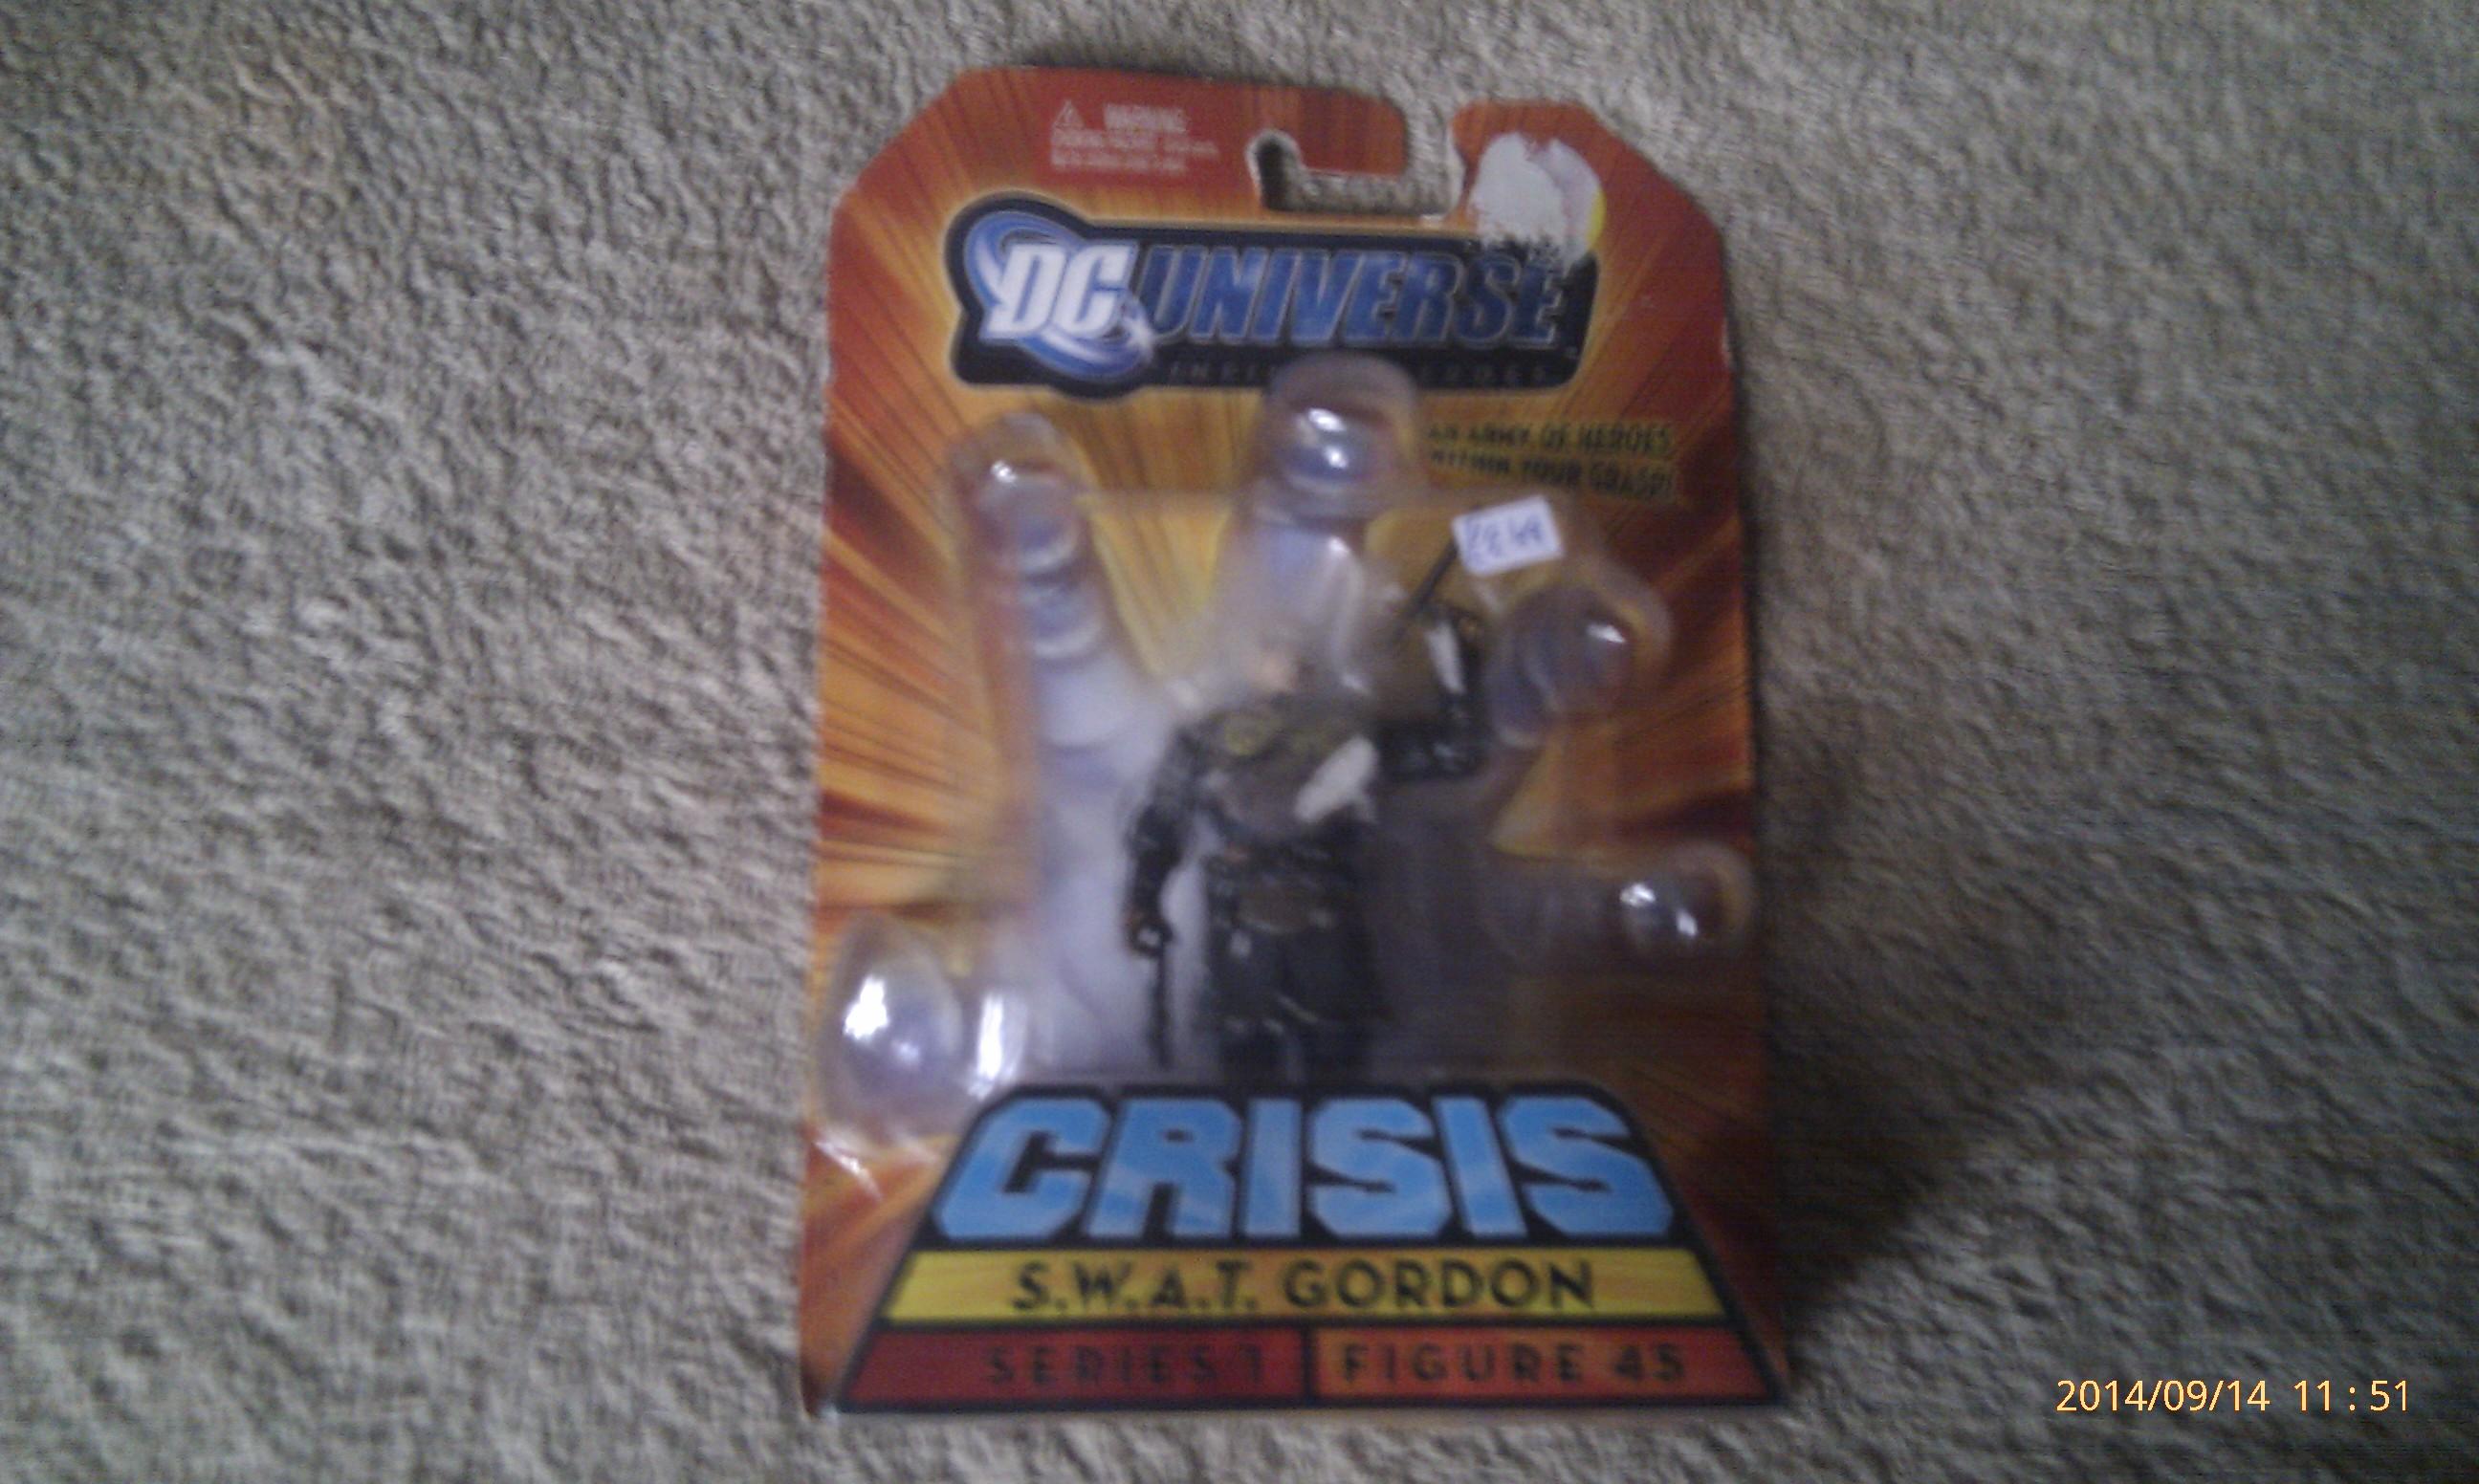 DC Universe Crisis SWAT Gordon Series 1 Figure 45